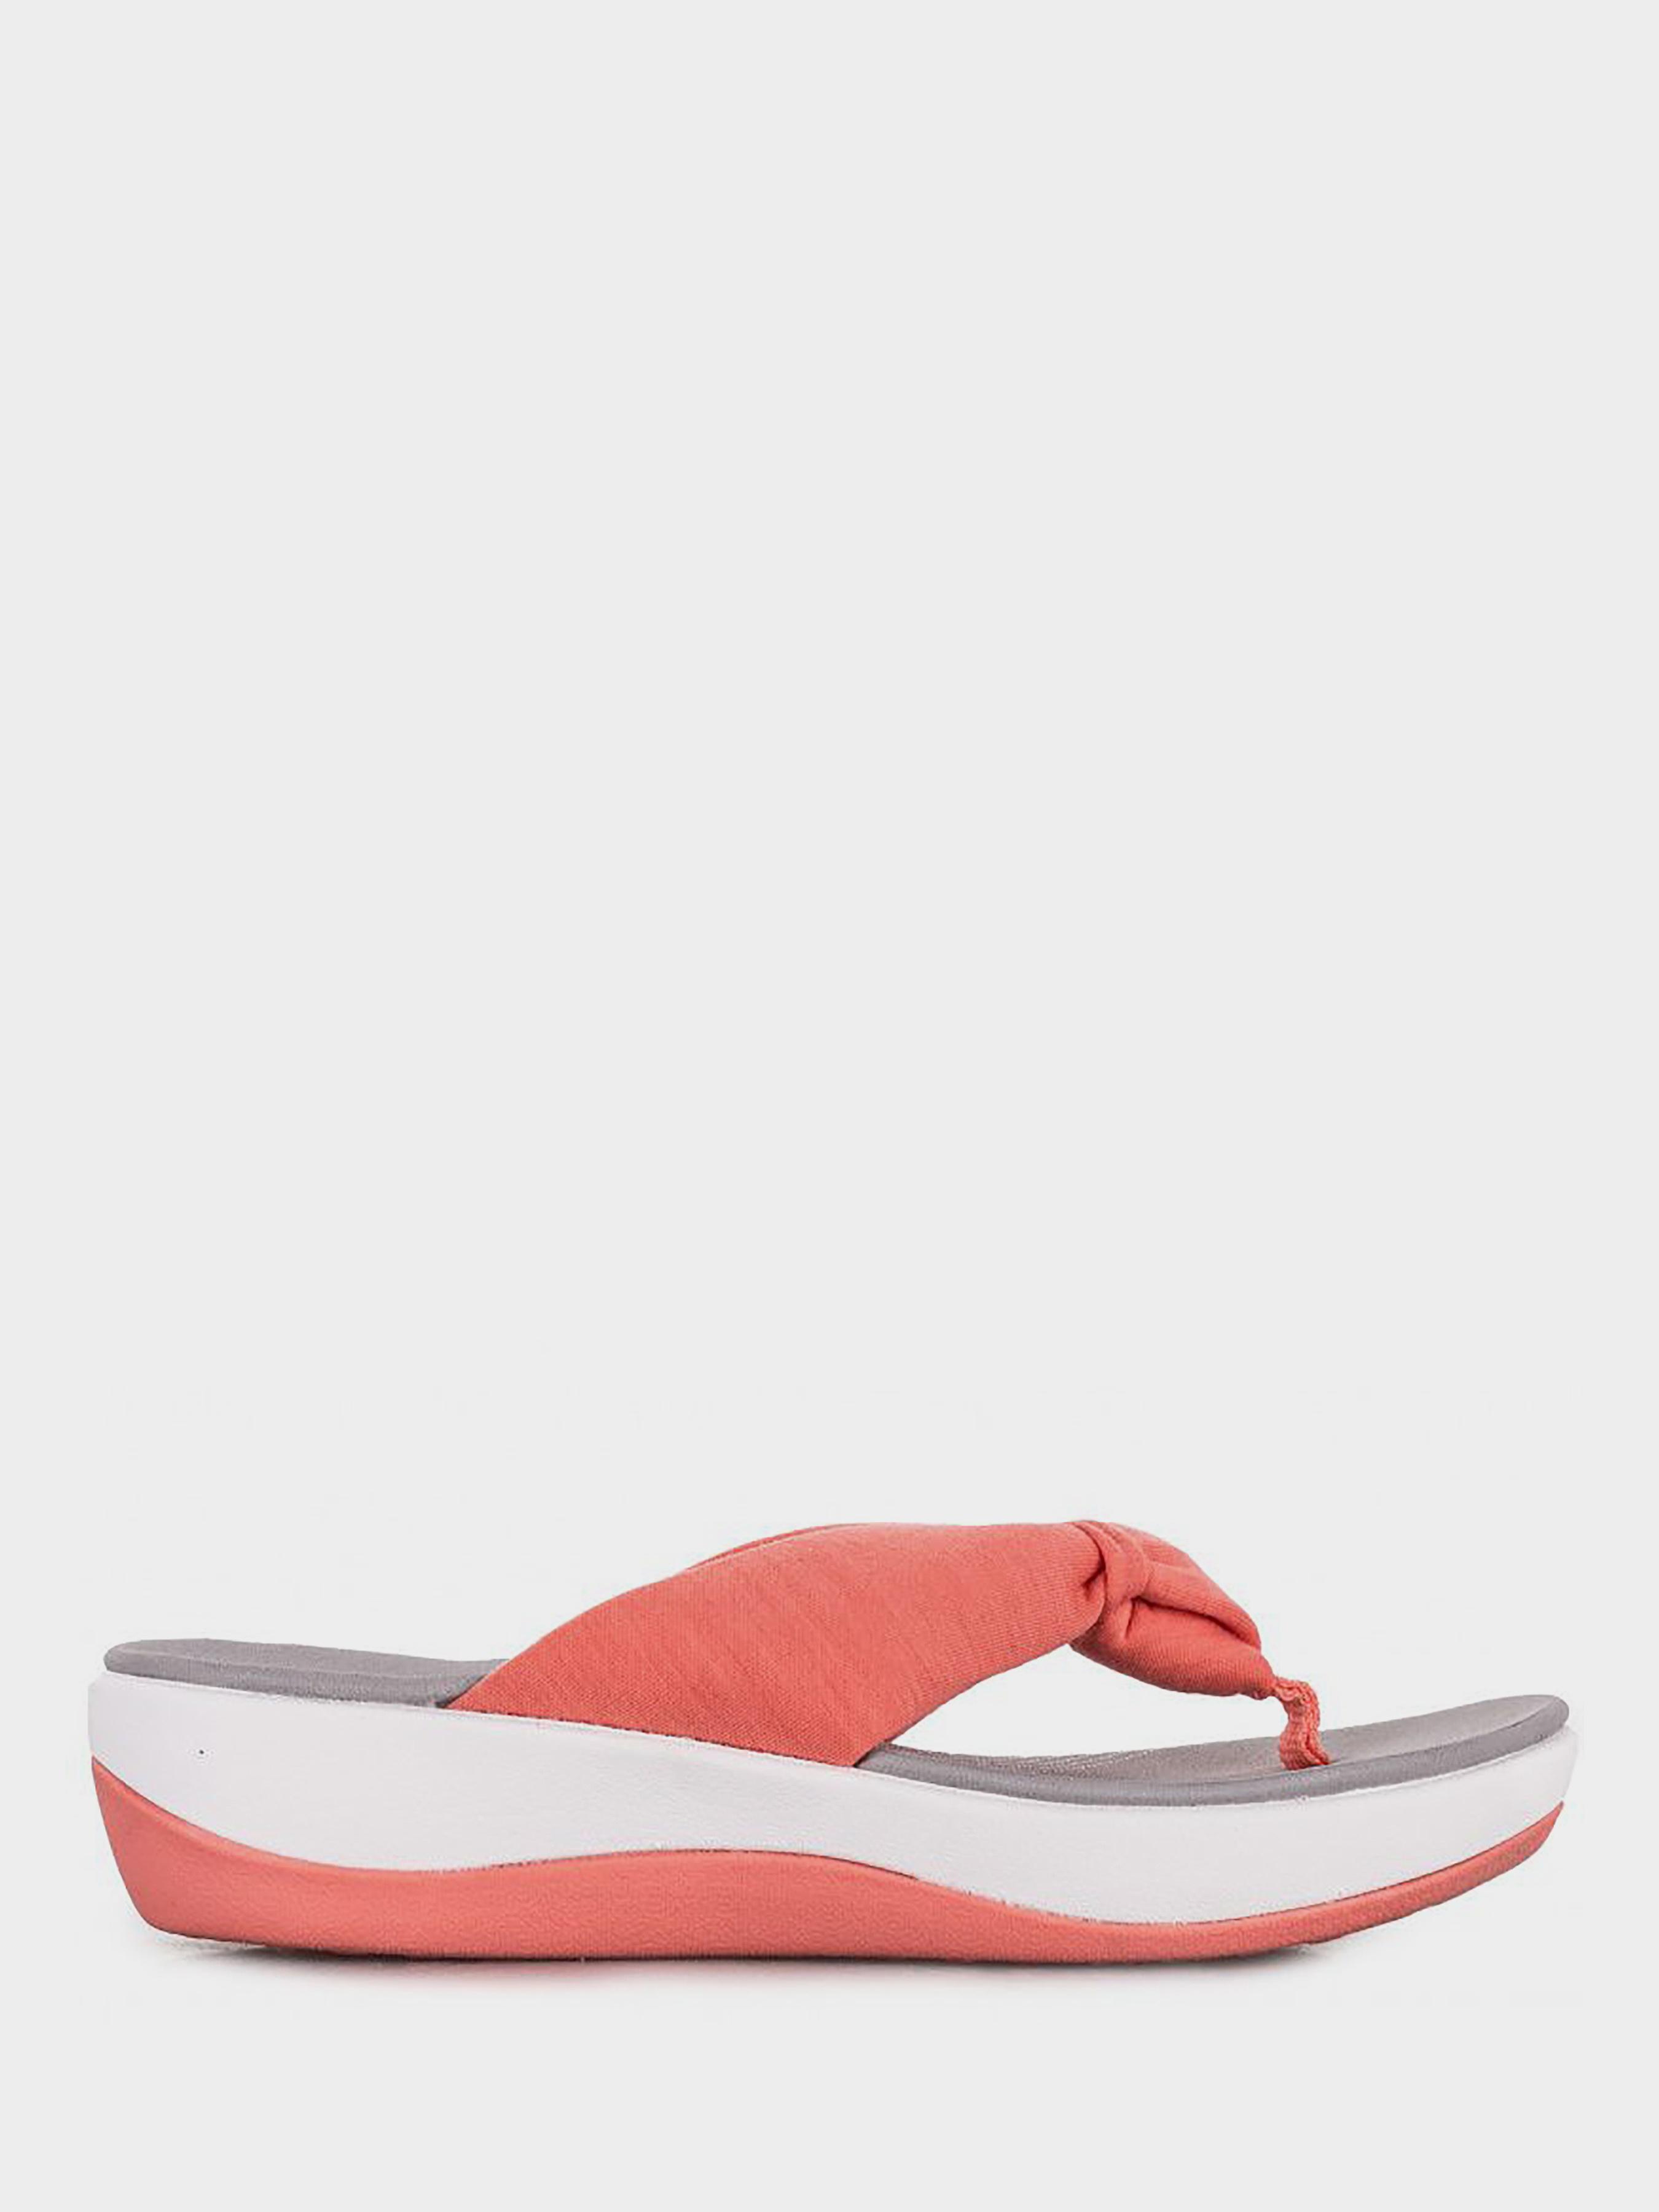 Шлёпанцы женские Clarks Arla Glison OW4378 размеры обуви, 2017